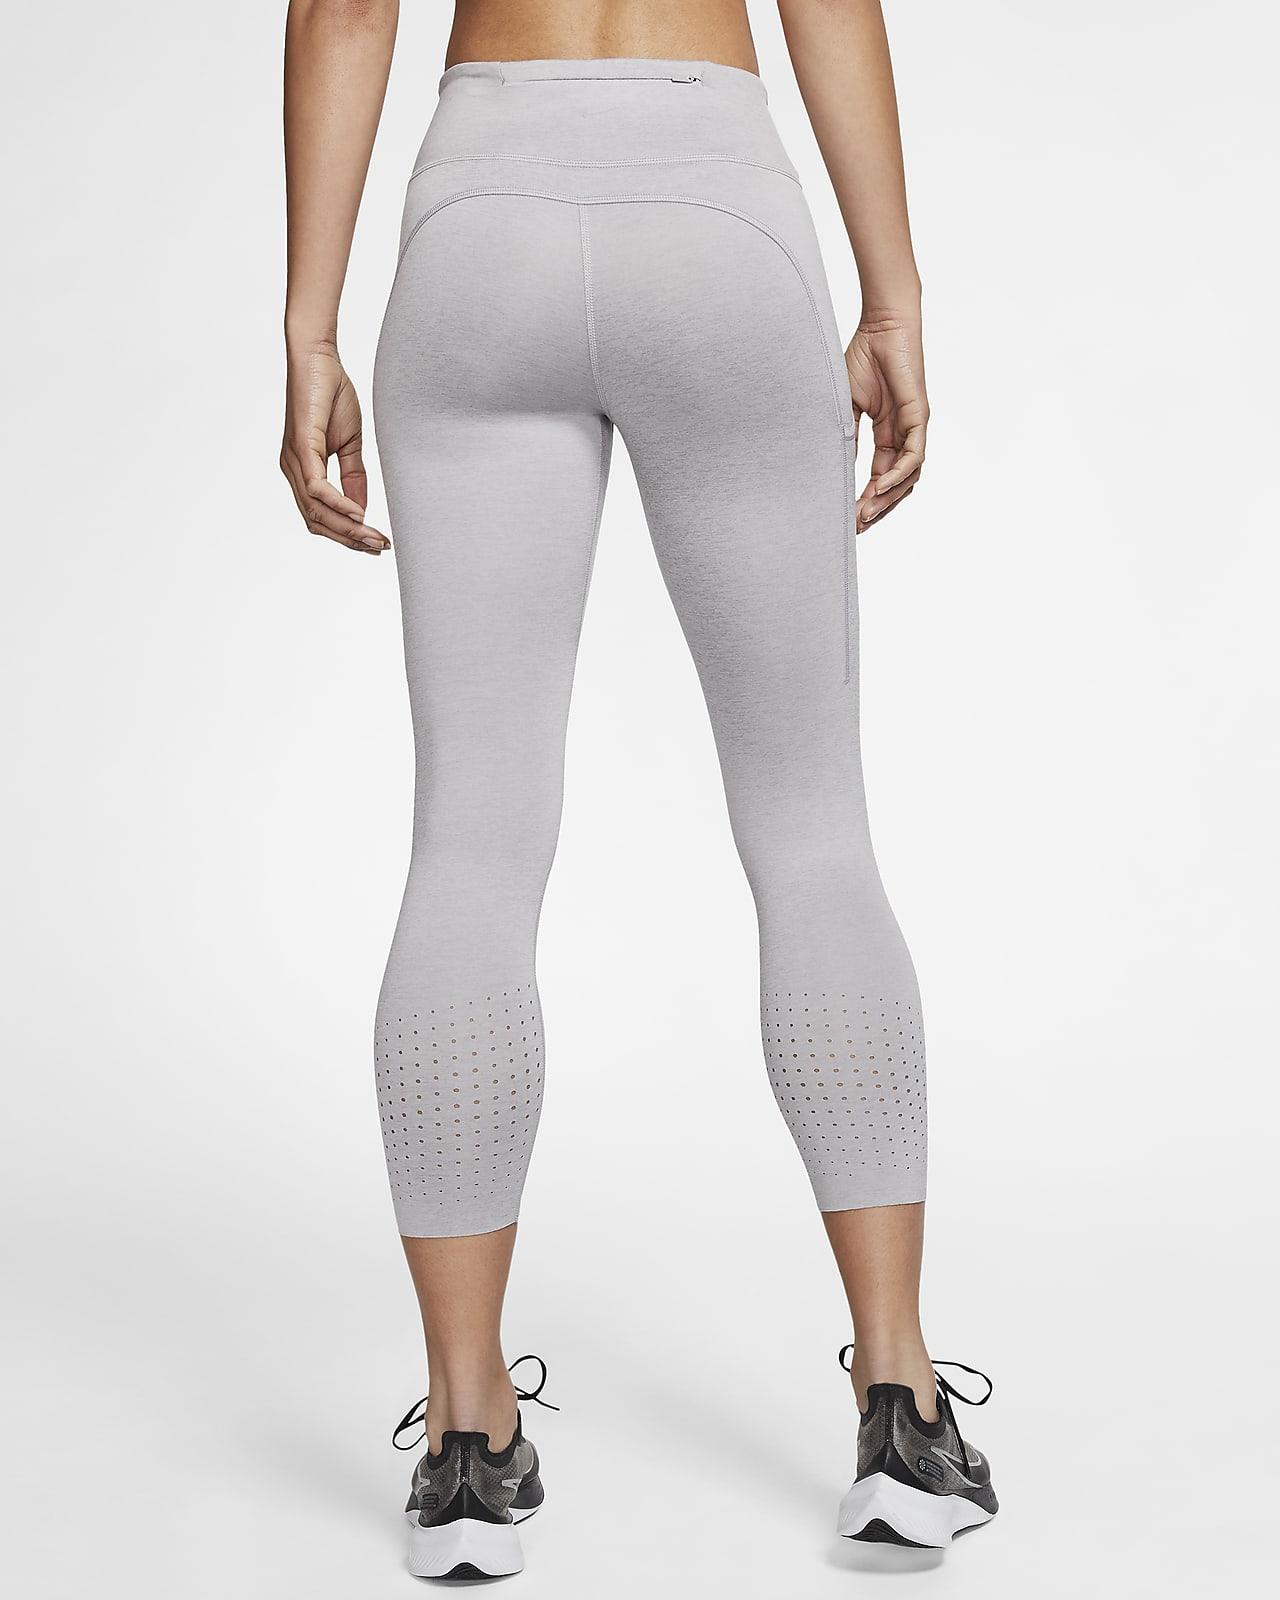 Mujer NIKE W Nk Epic LX Crop Pantalones de Deporte